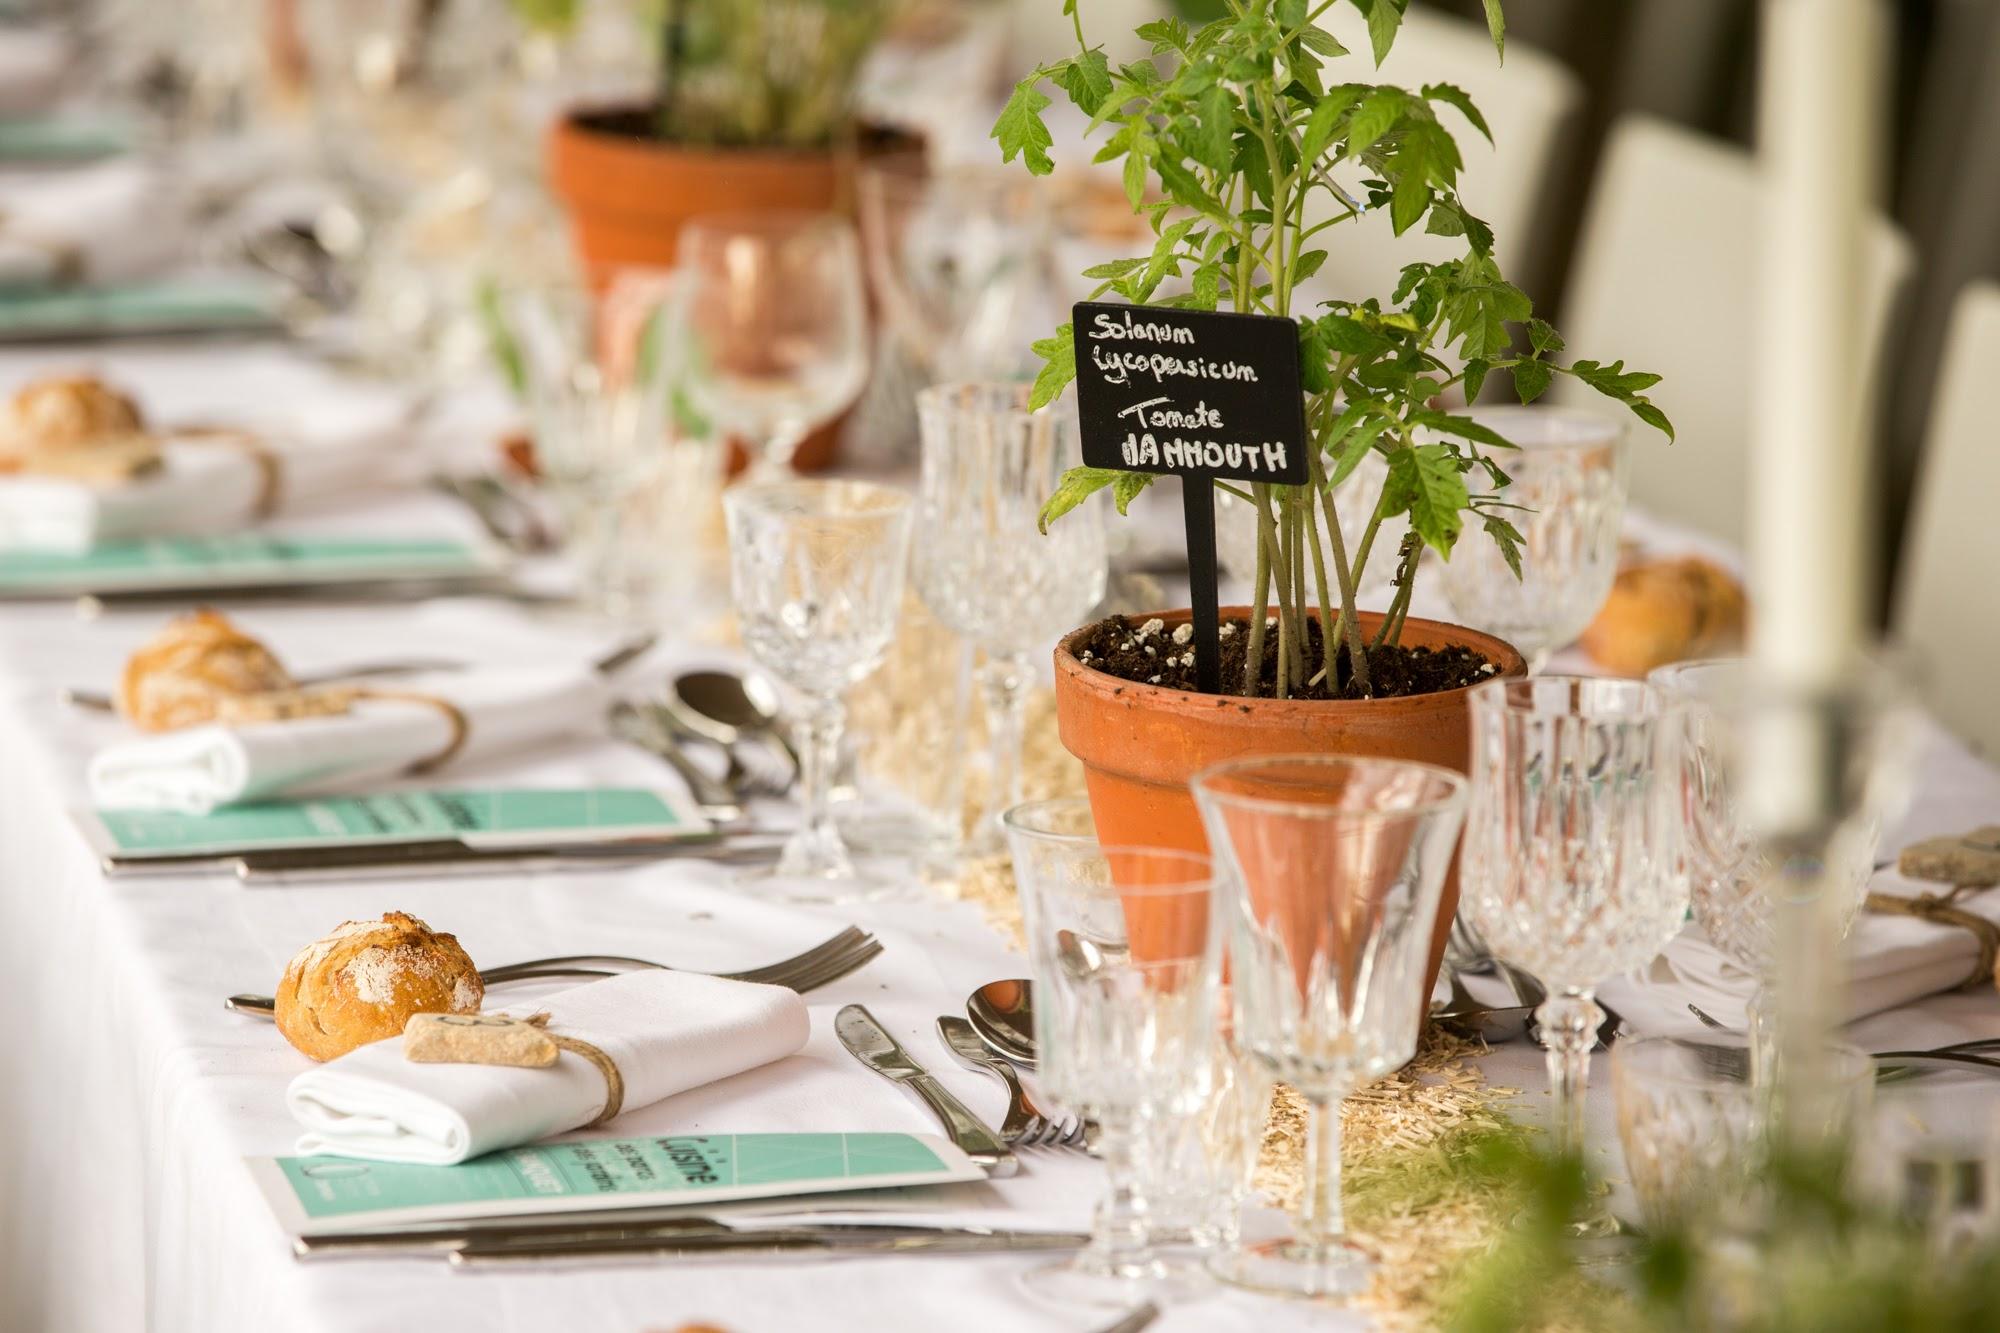 banquet lyon city demain